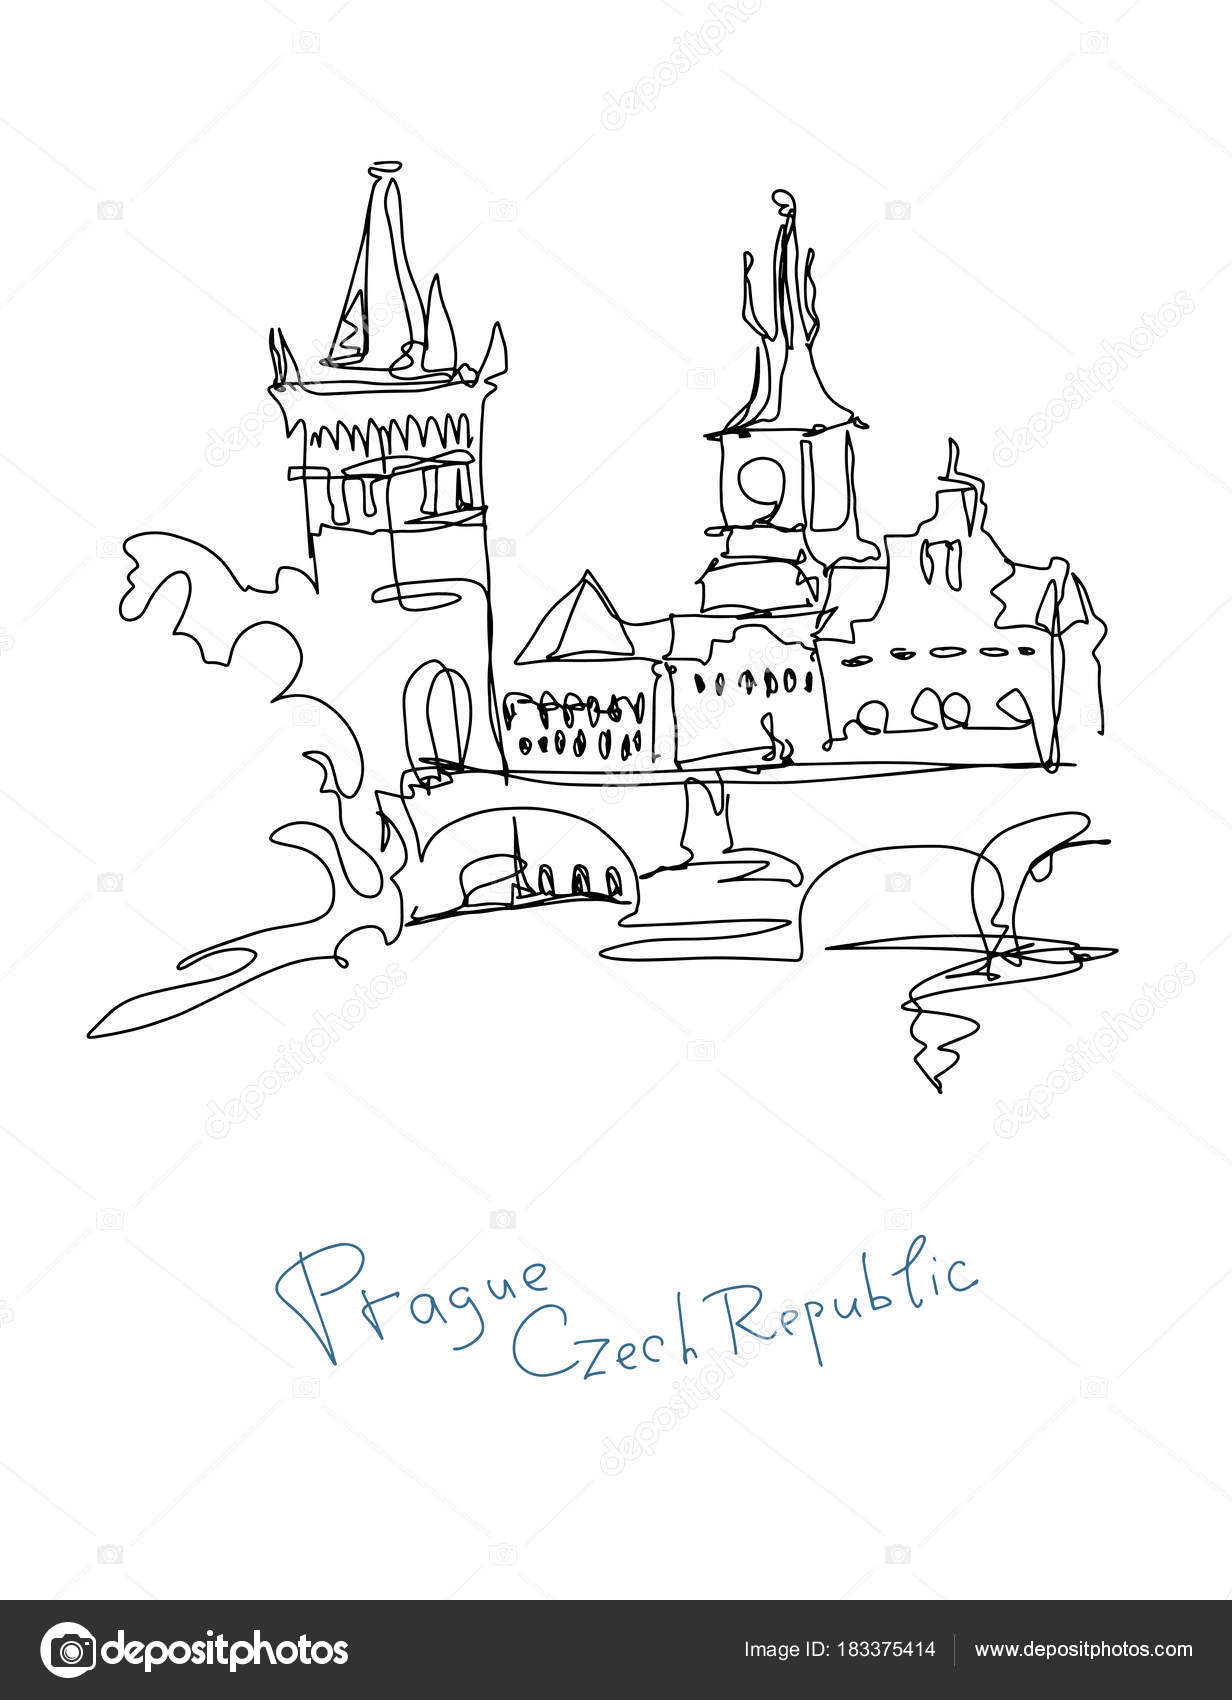 dibujo de línea continua de República Checa Praga — Vector de stock ...